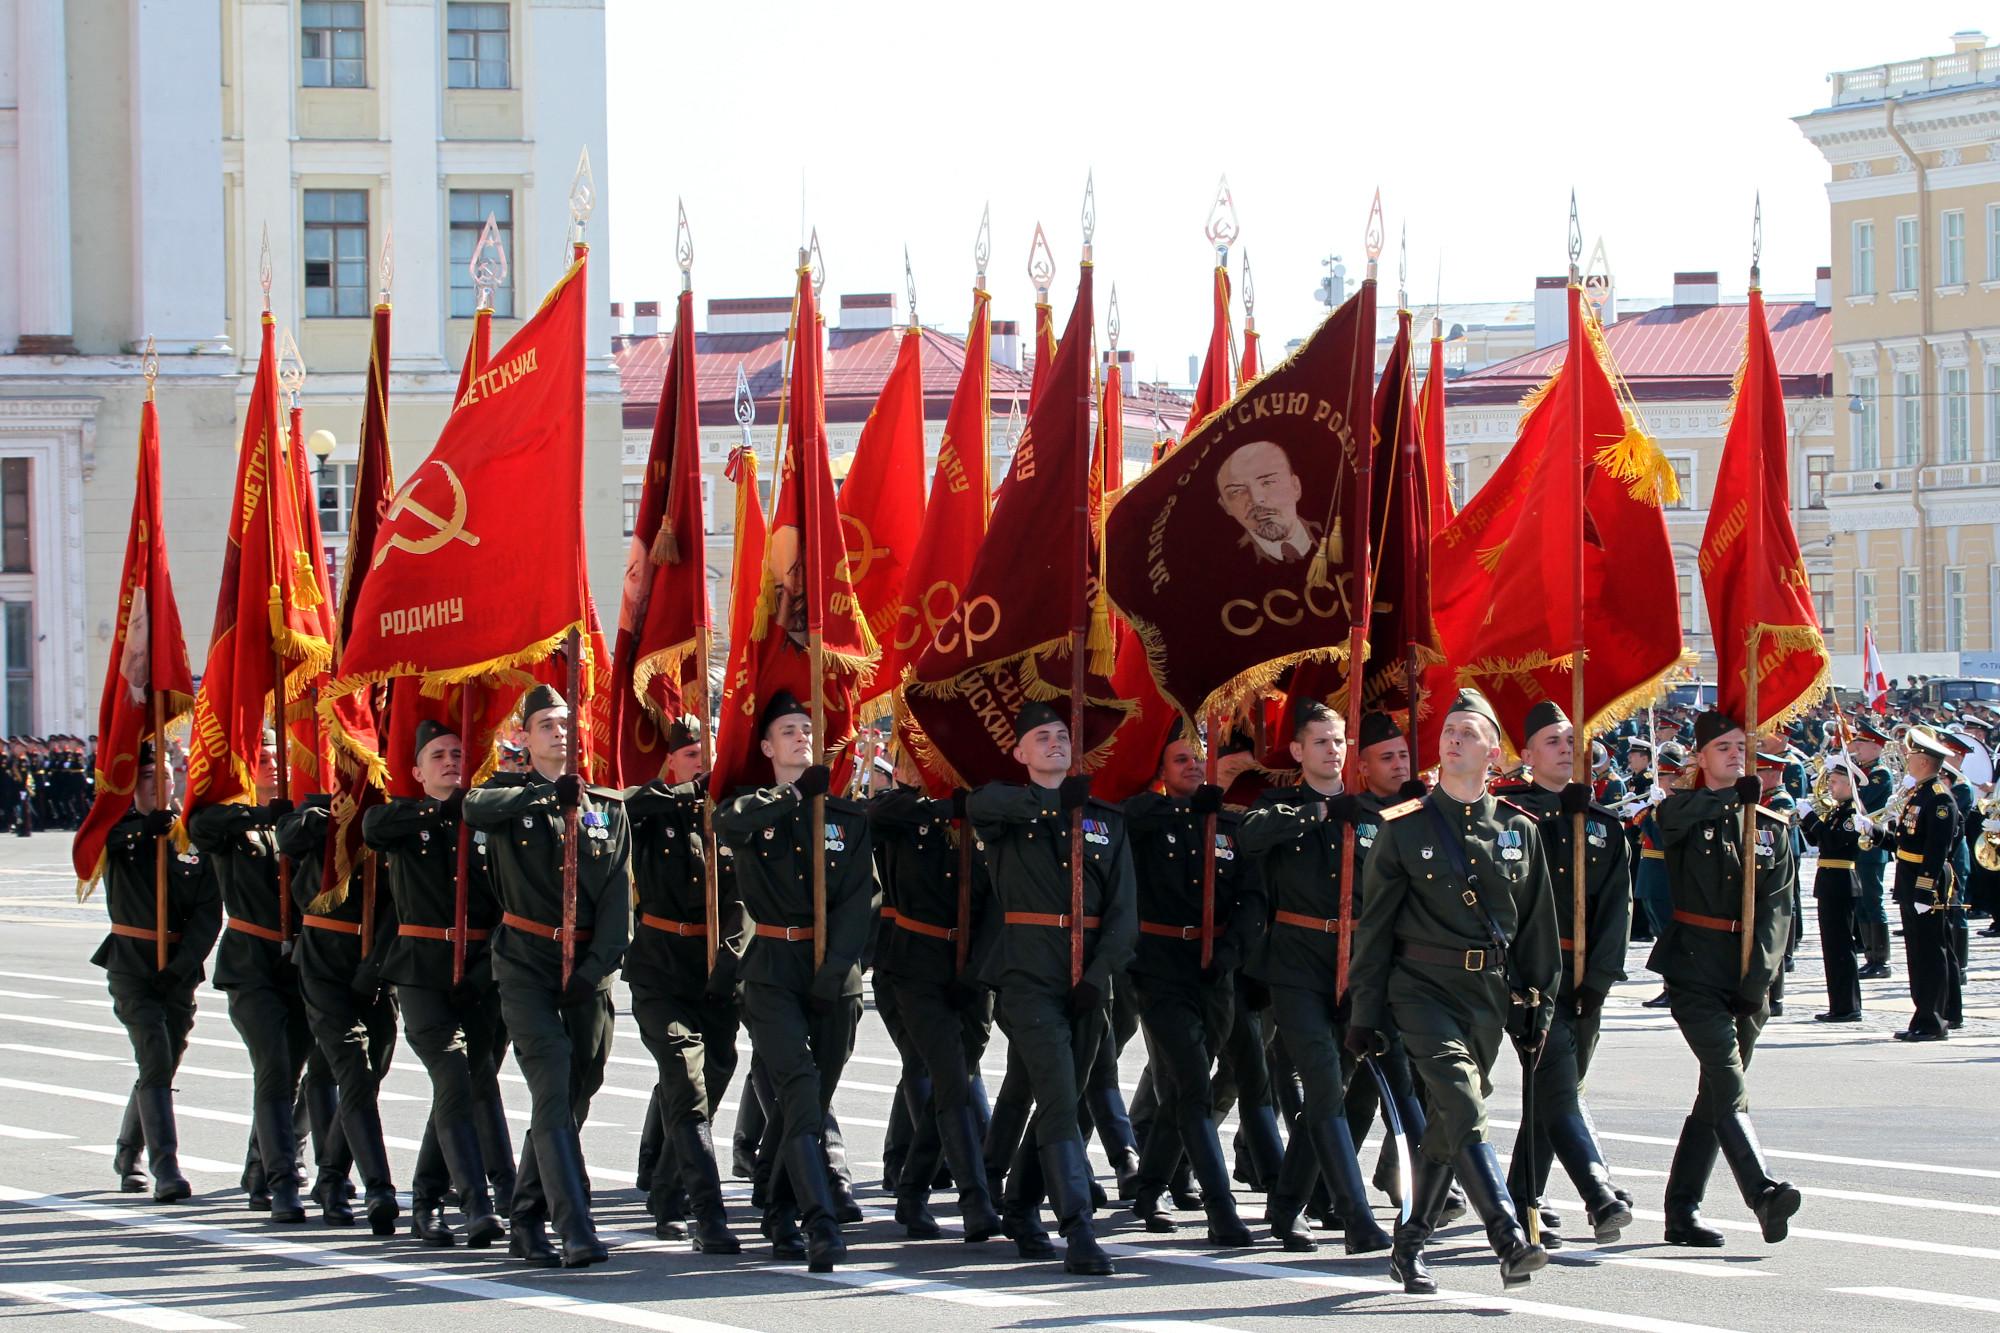 парад победы, военнослужащие, армия, солдаты, знамёна, флаги